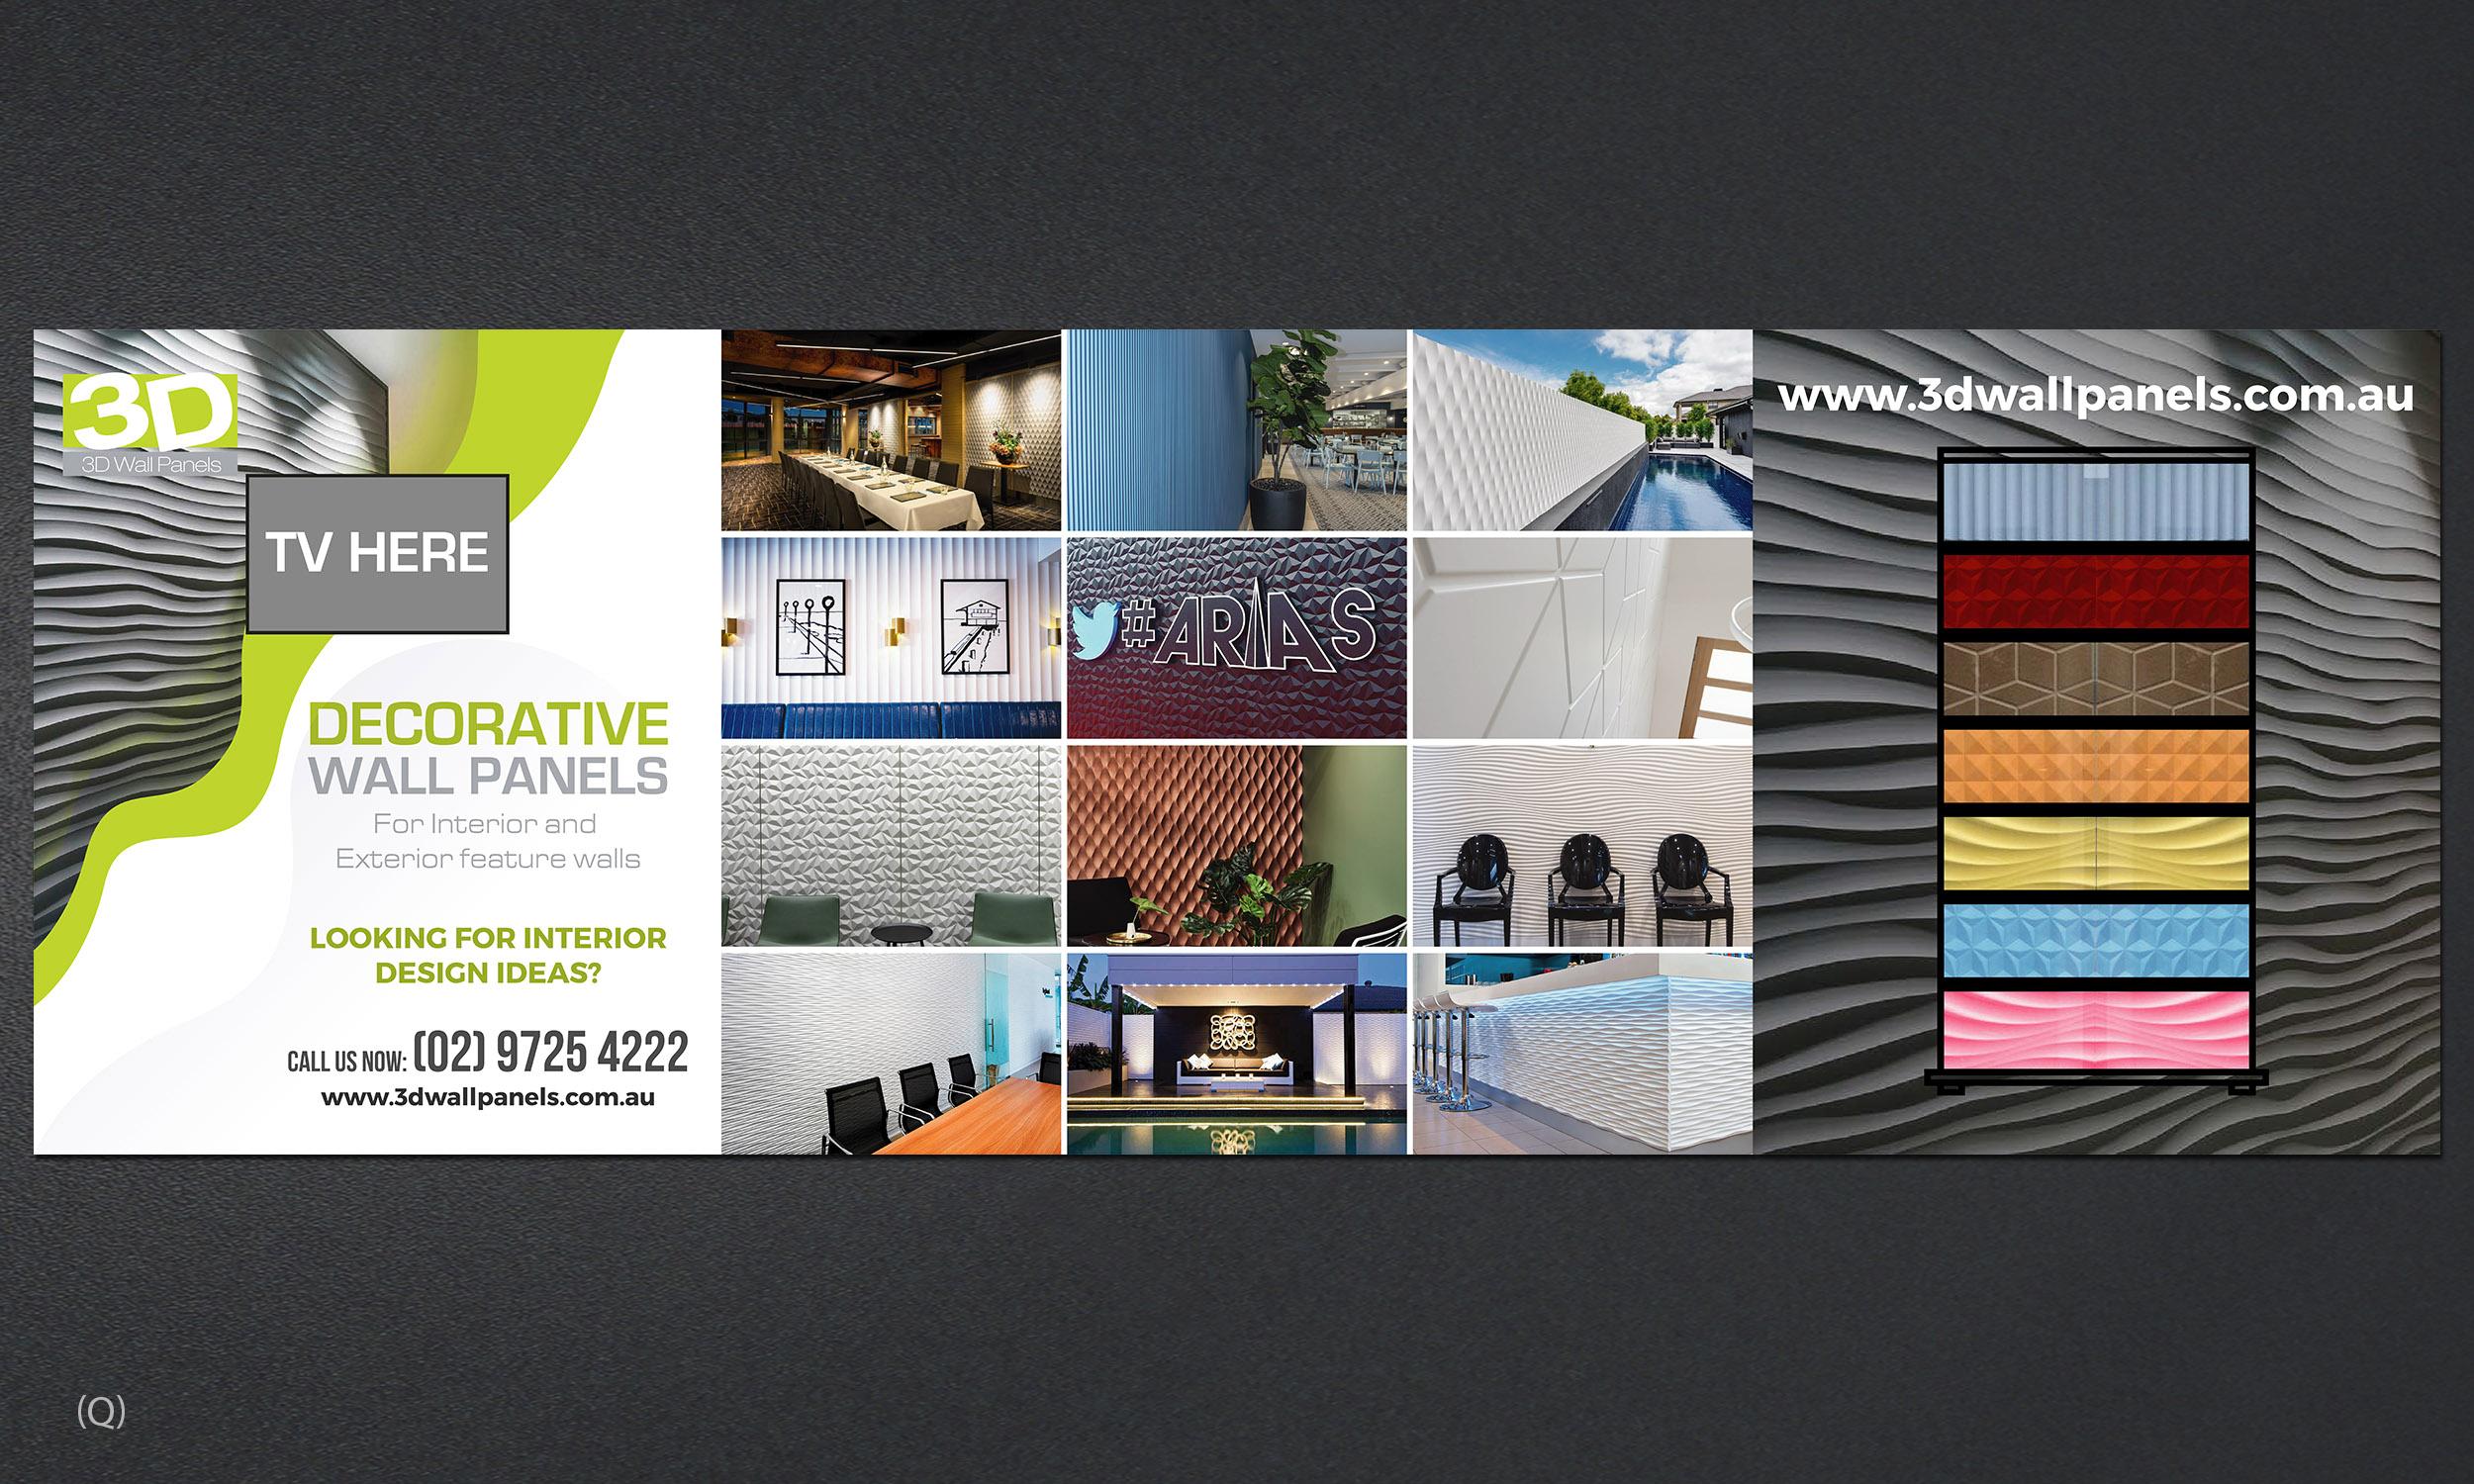 Elegant Playful Interior Design Trade Show Booth Design For 3d Wall Panels By Designanddevelopment Design 21770566